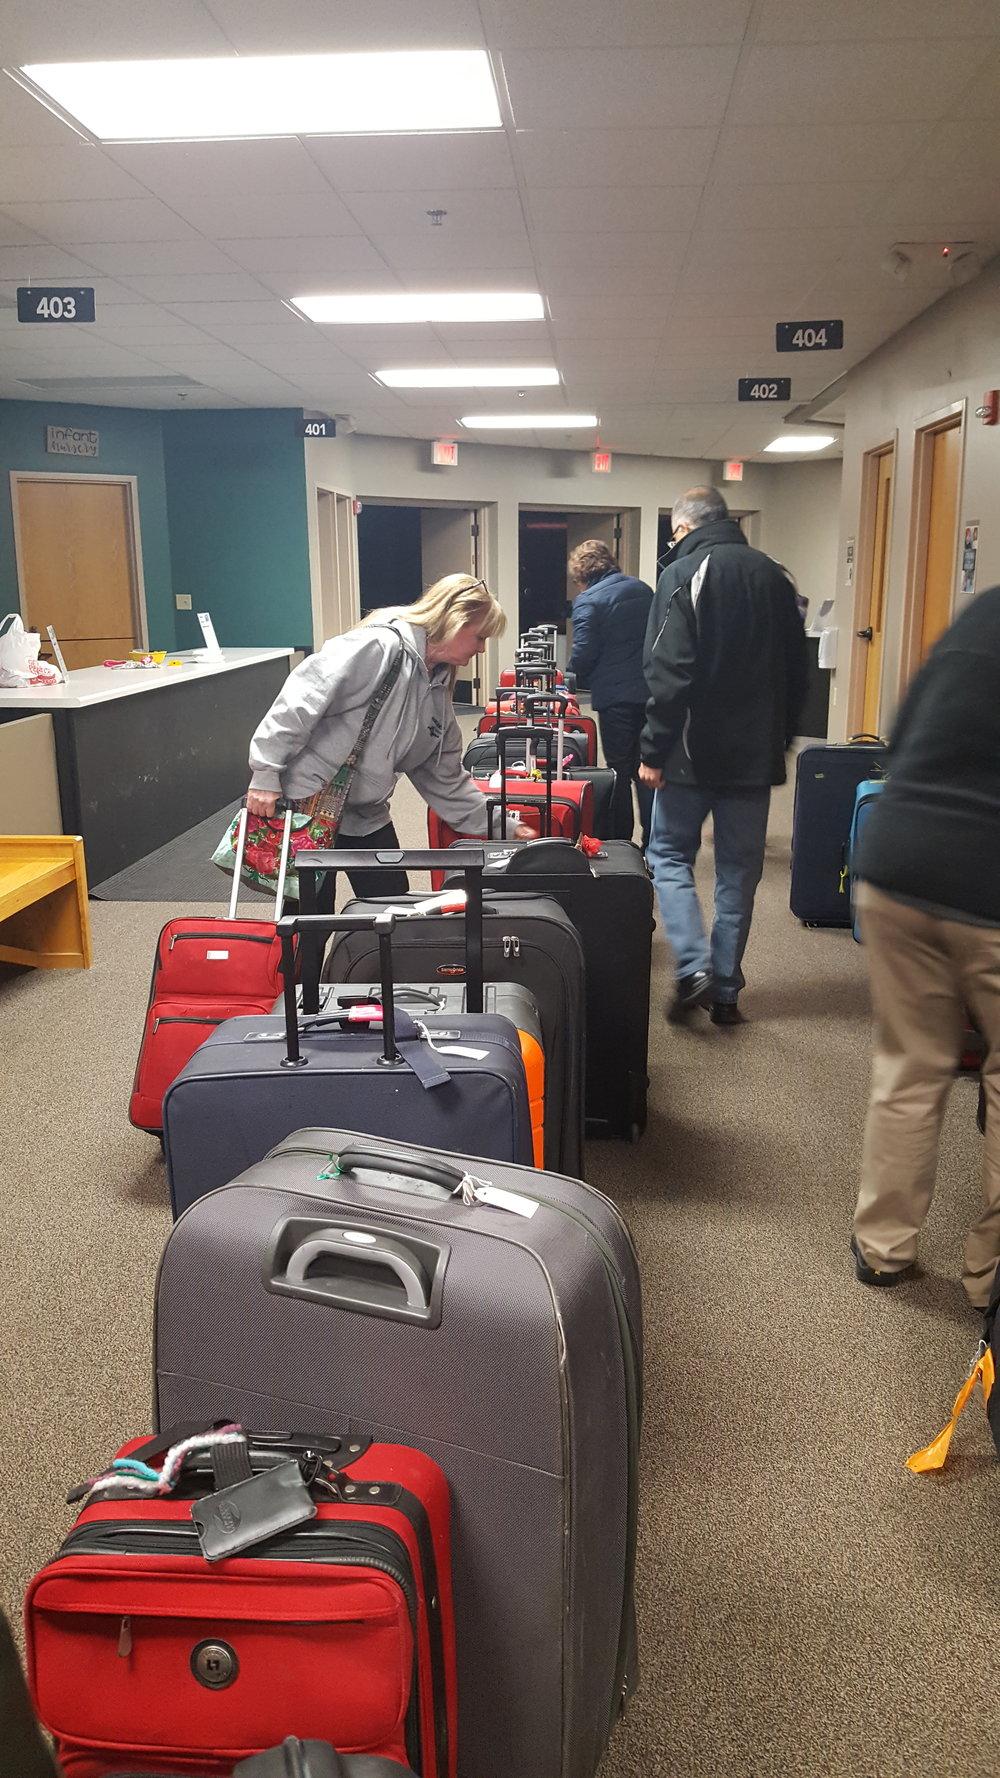 2. Luggage galore!.jpg